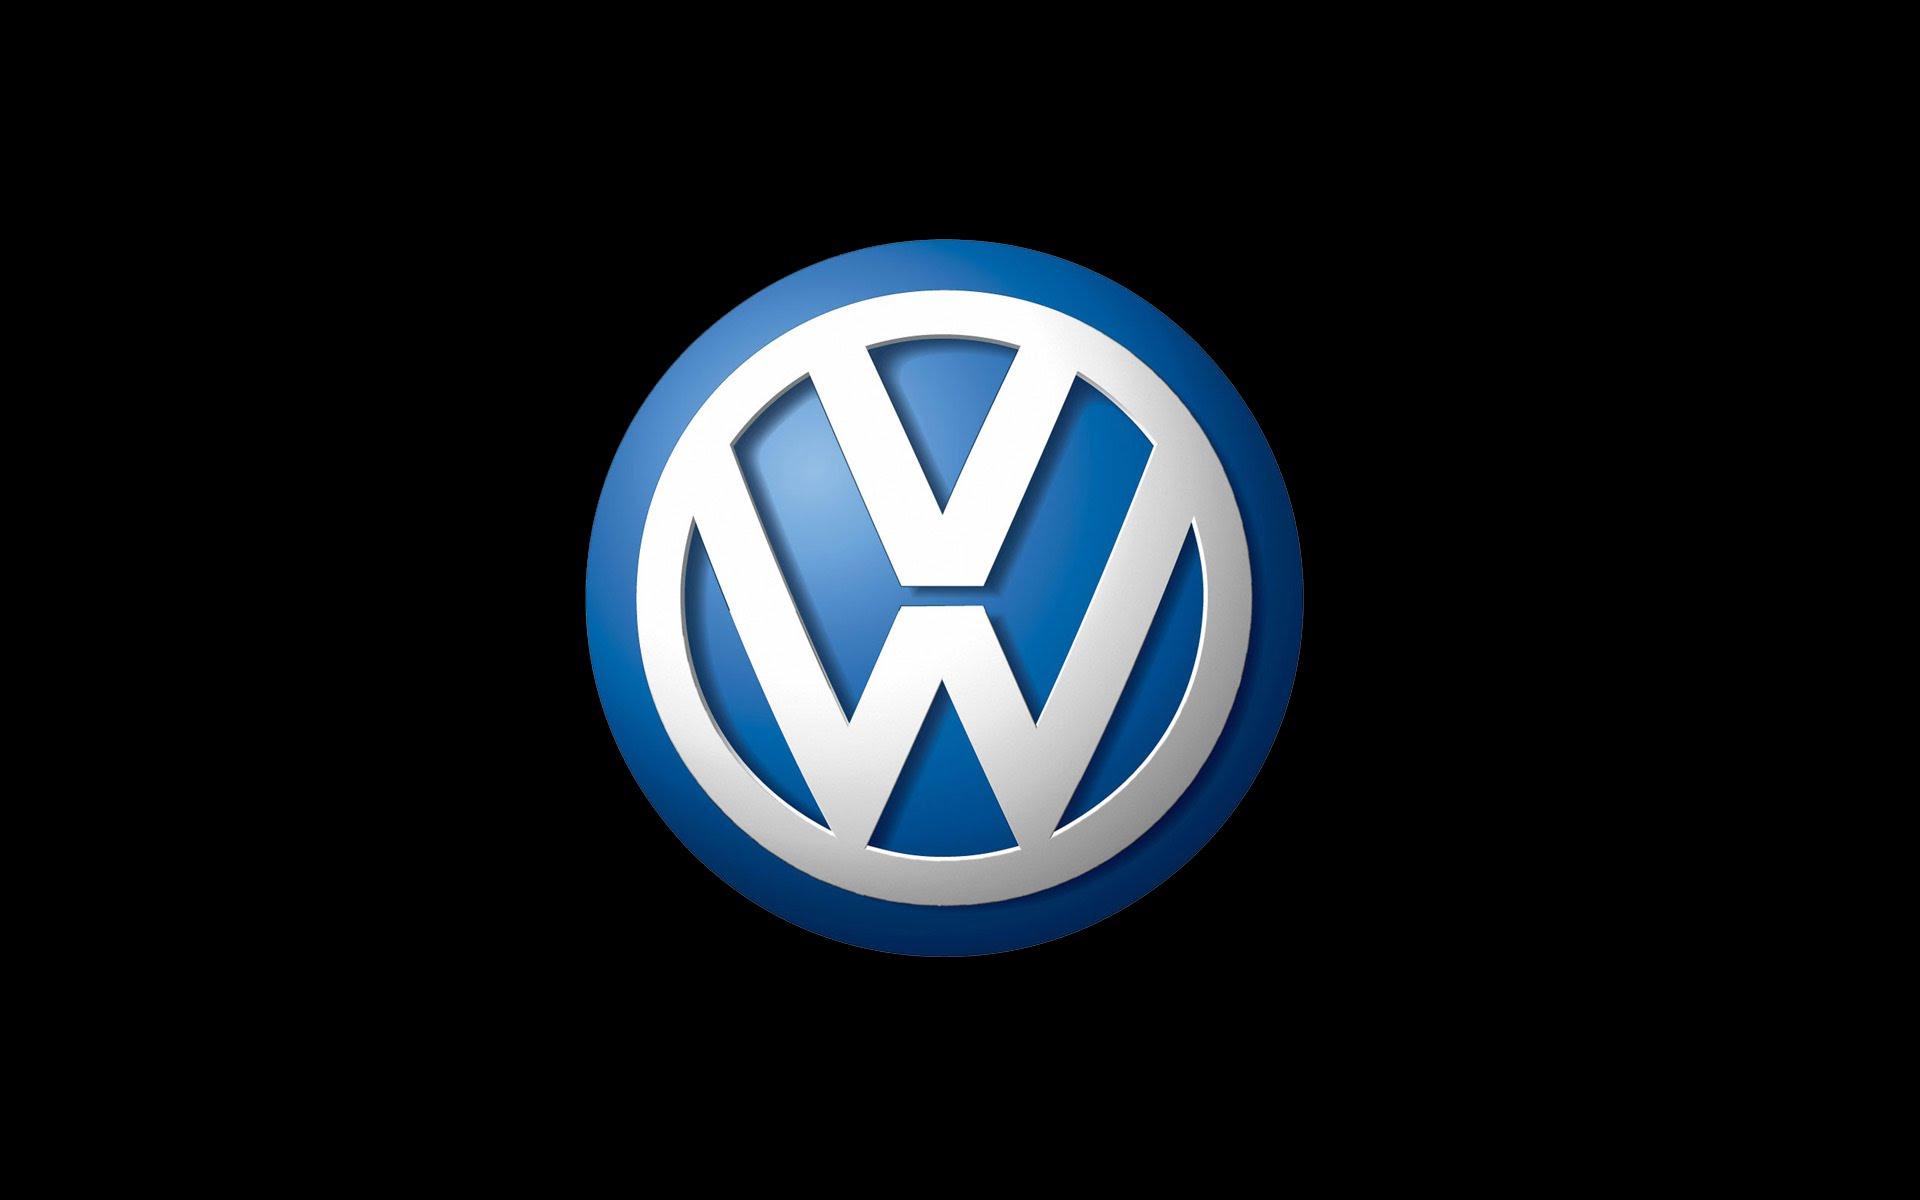 Volkswagen va instala 2800 de statii de incarcare pentru masini electrice in Statele Unite pana in 2019